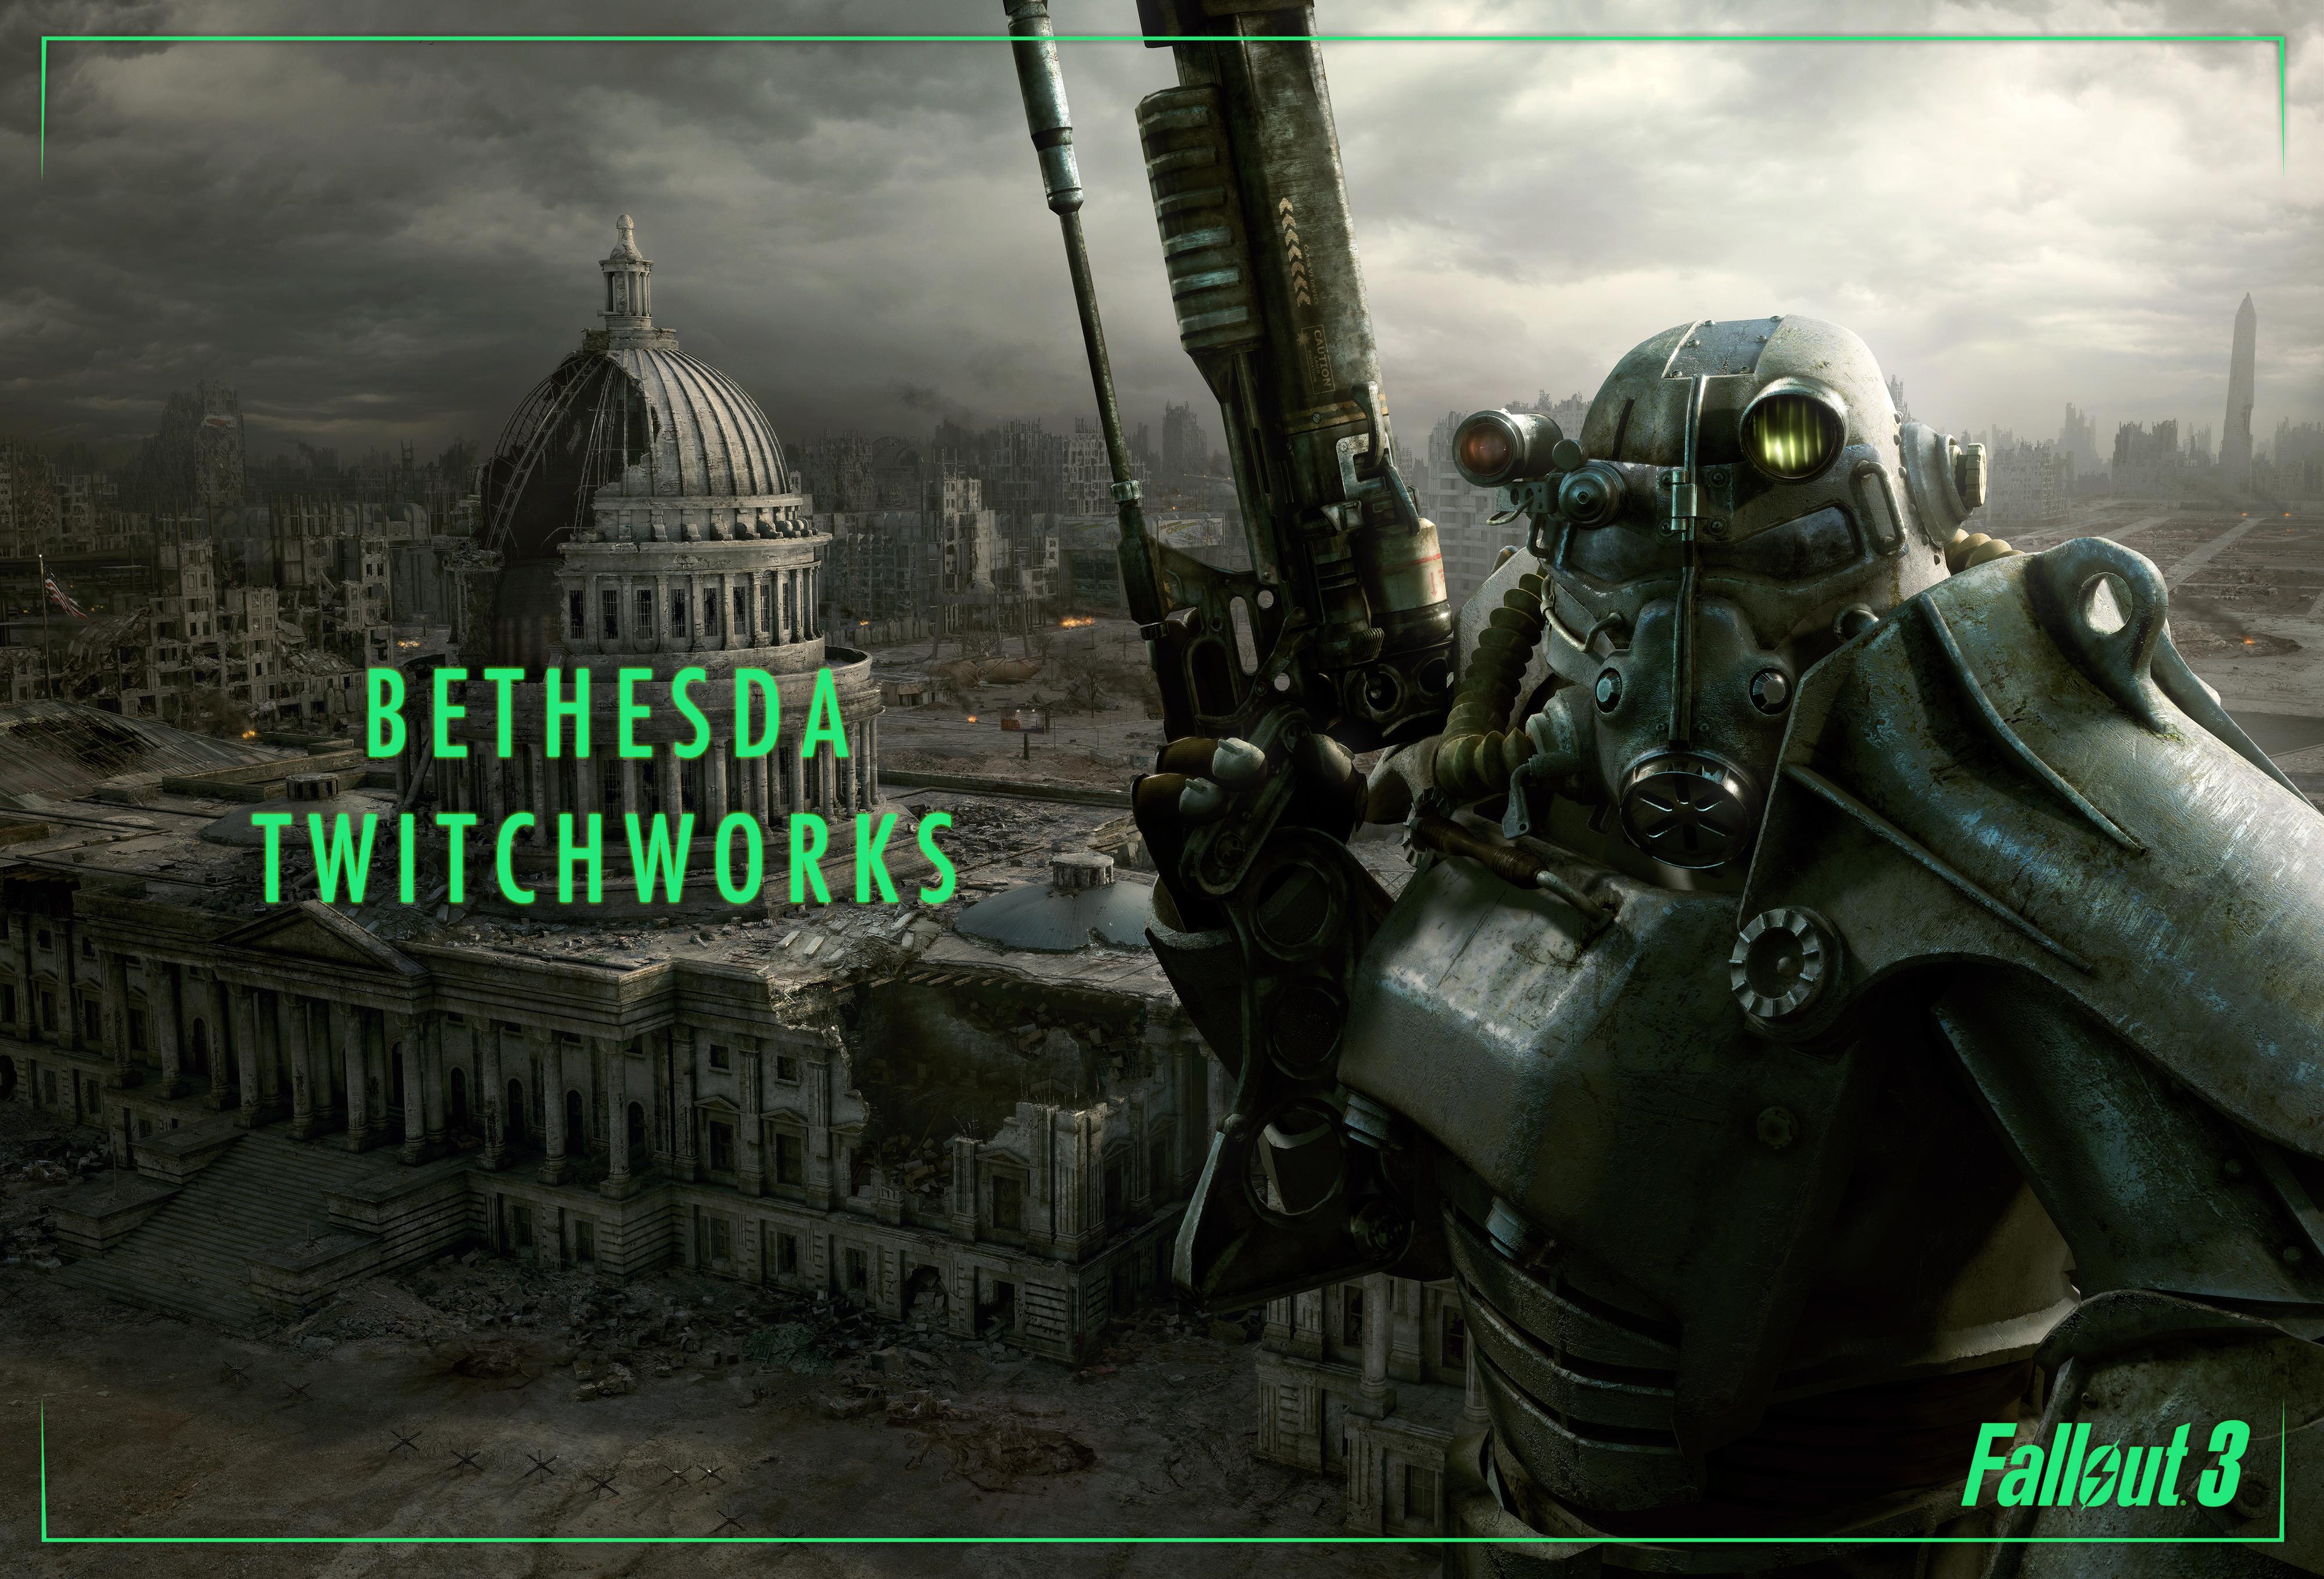 twitch-fallout3-bethesda_twitchworks